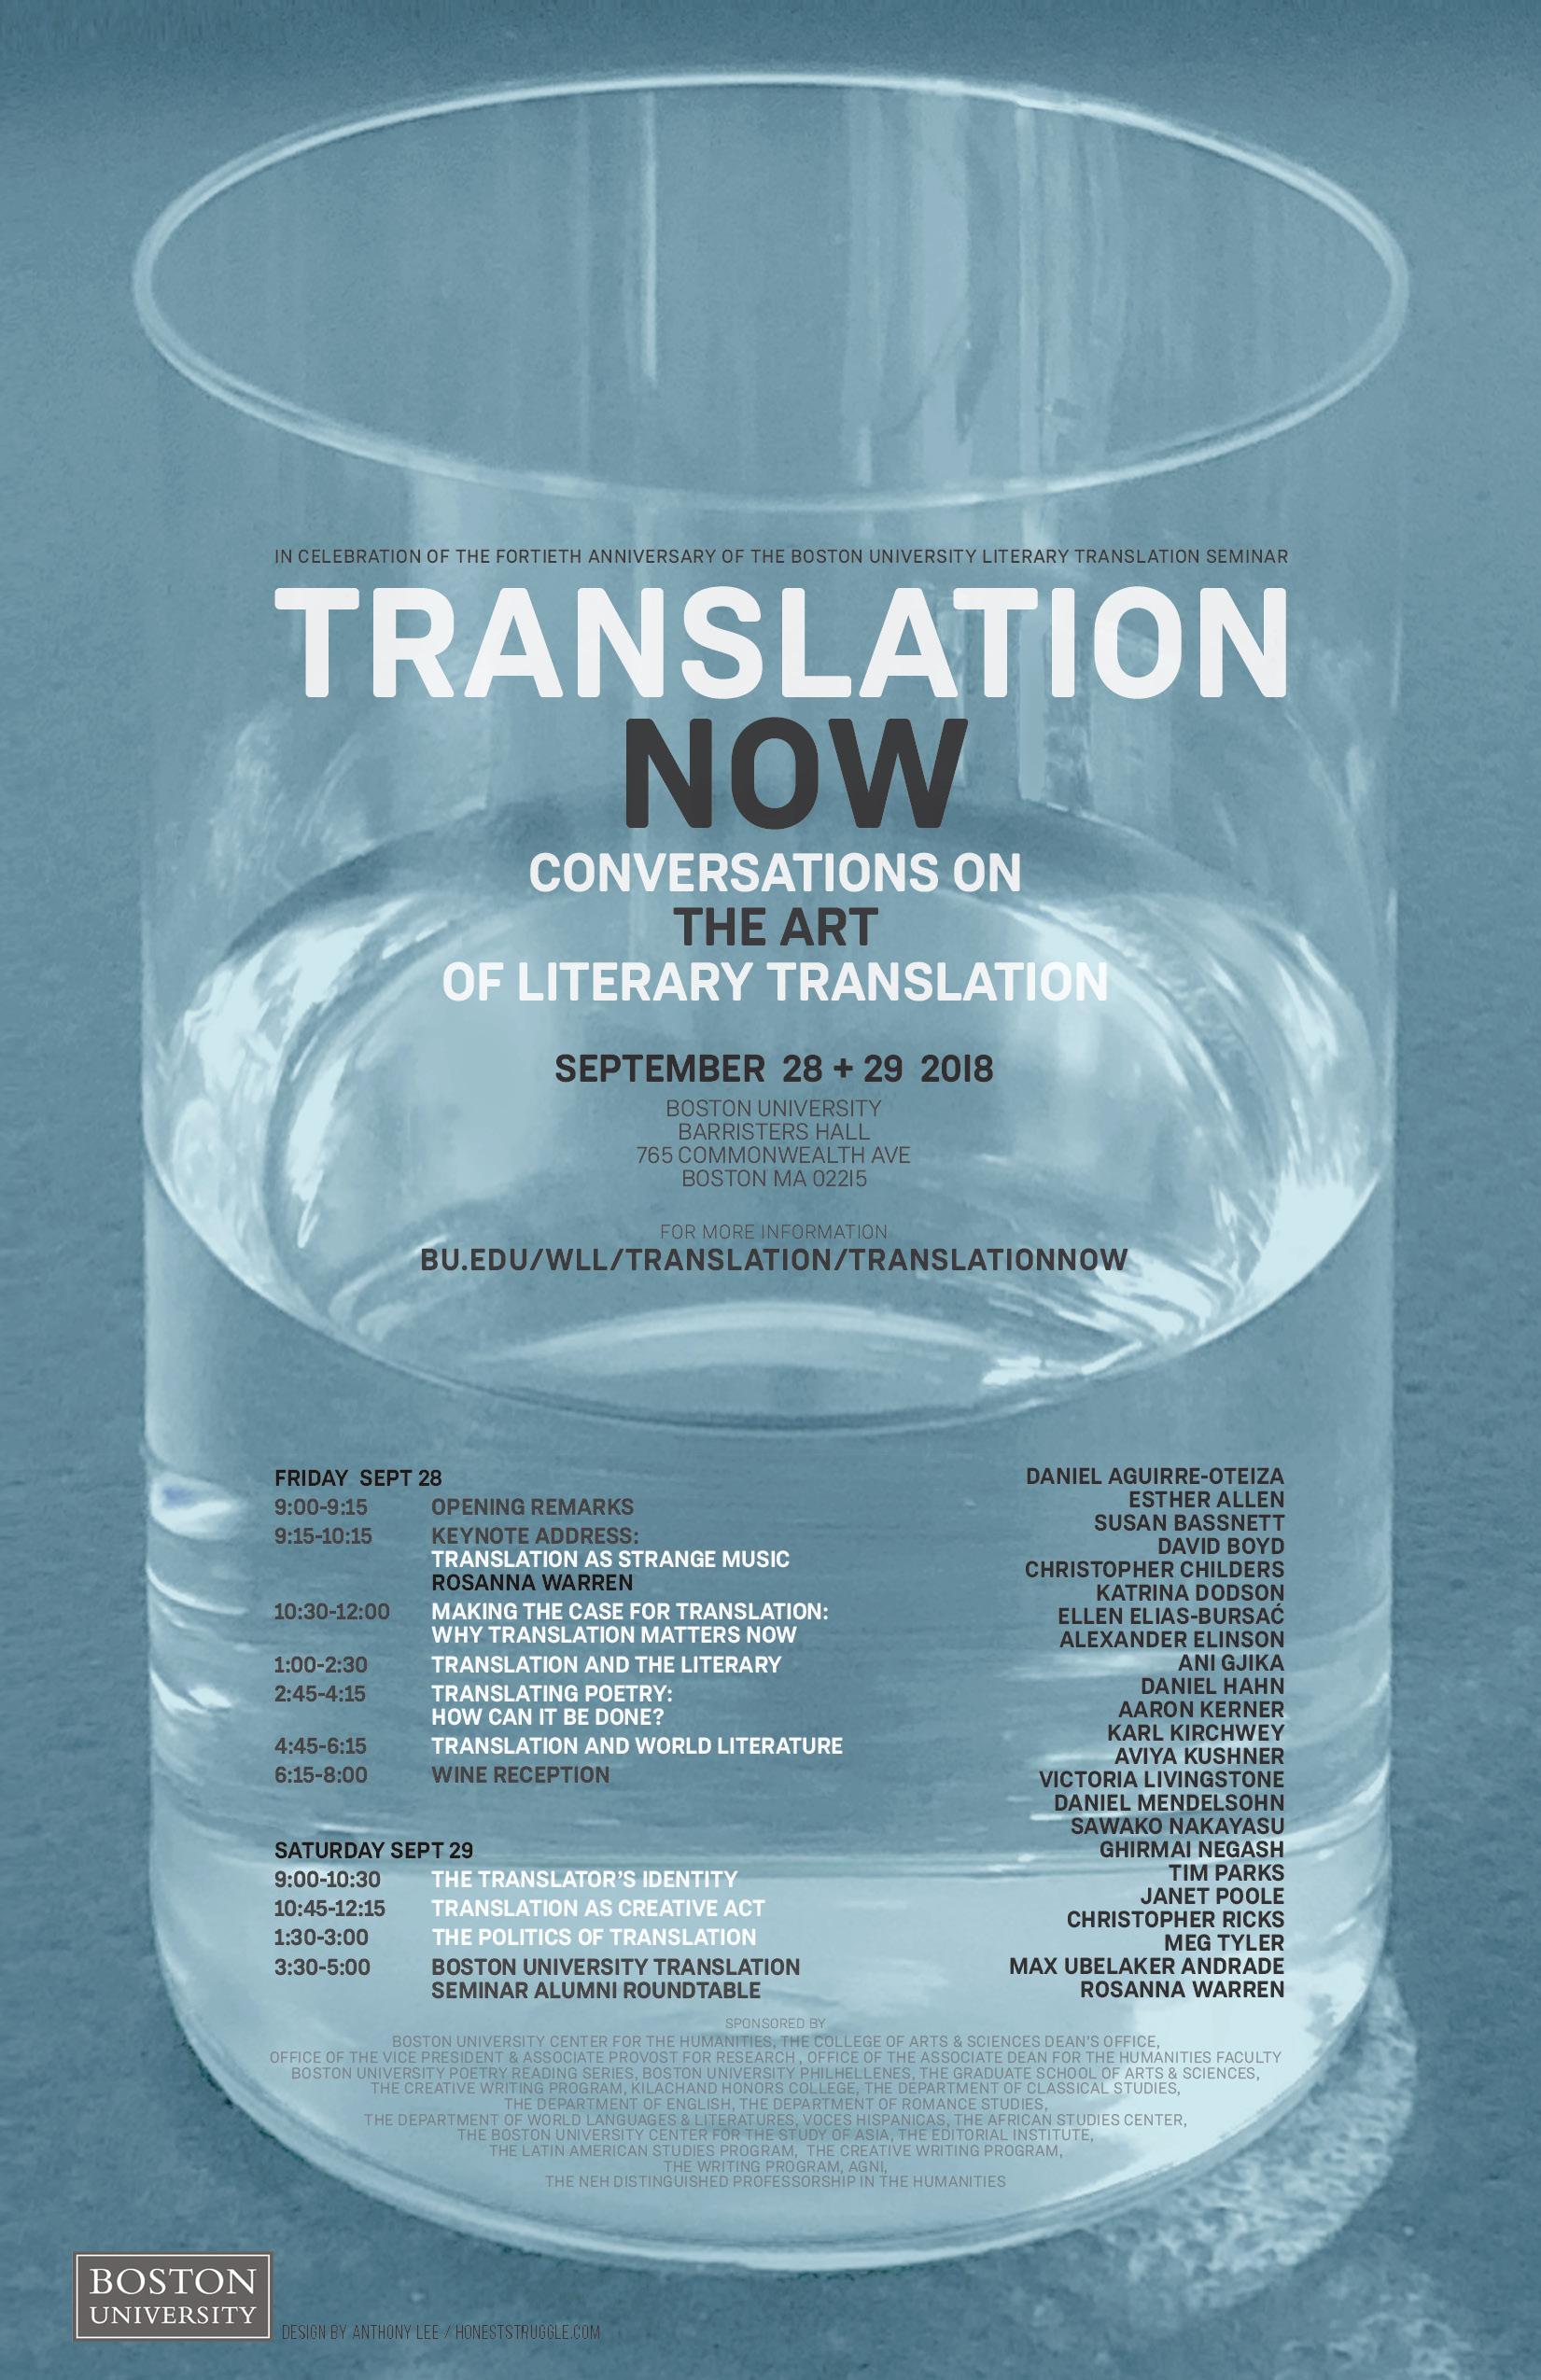 Conversations on the Art of Literary Translation